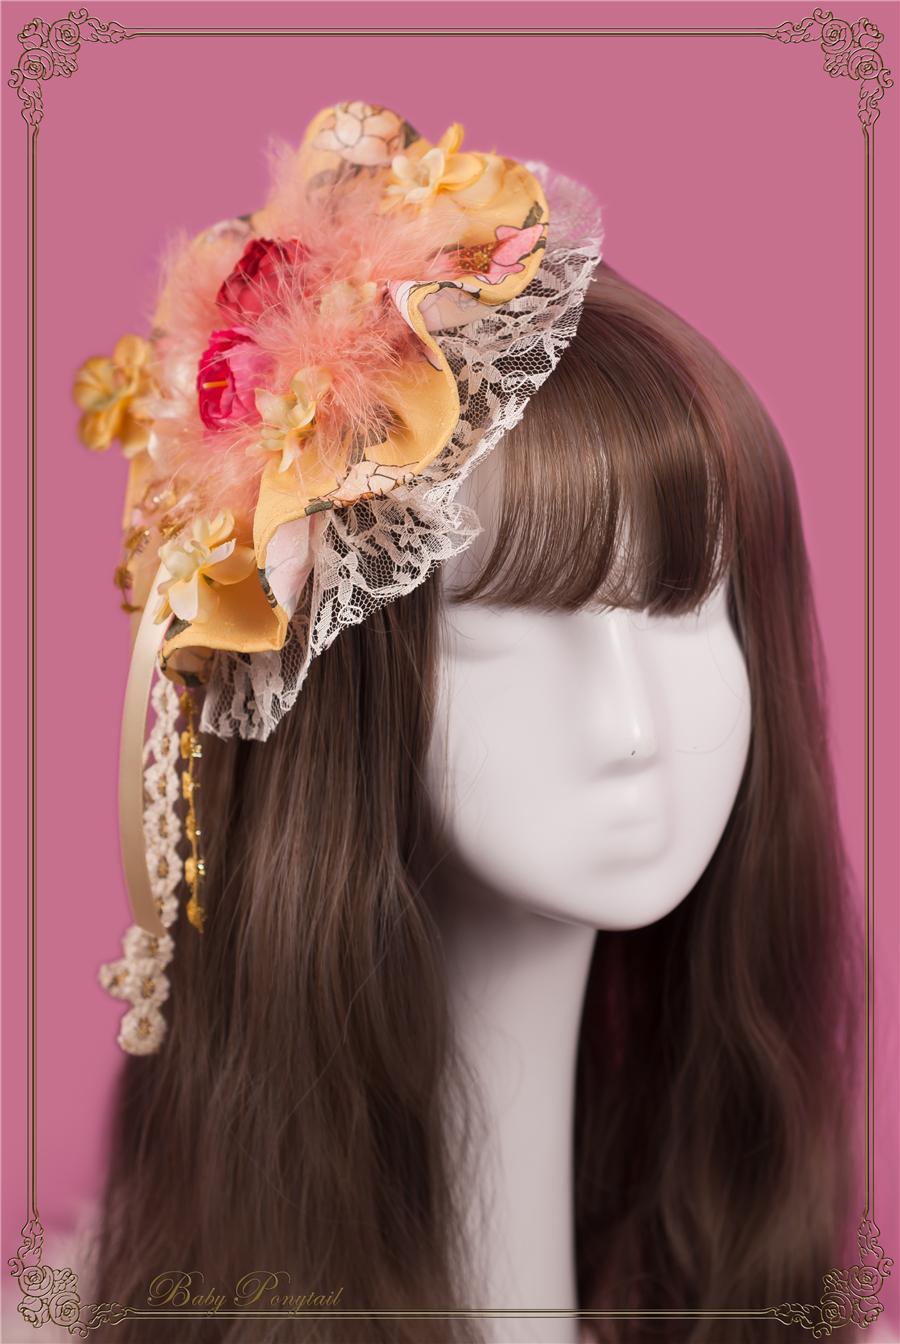 Babyponytail_Accessory_Flower Head Dress_2.jpg